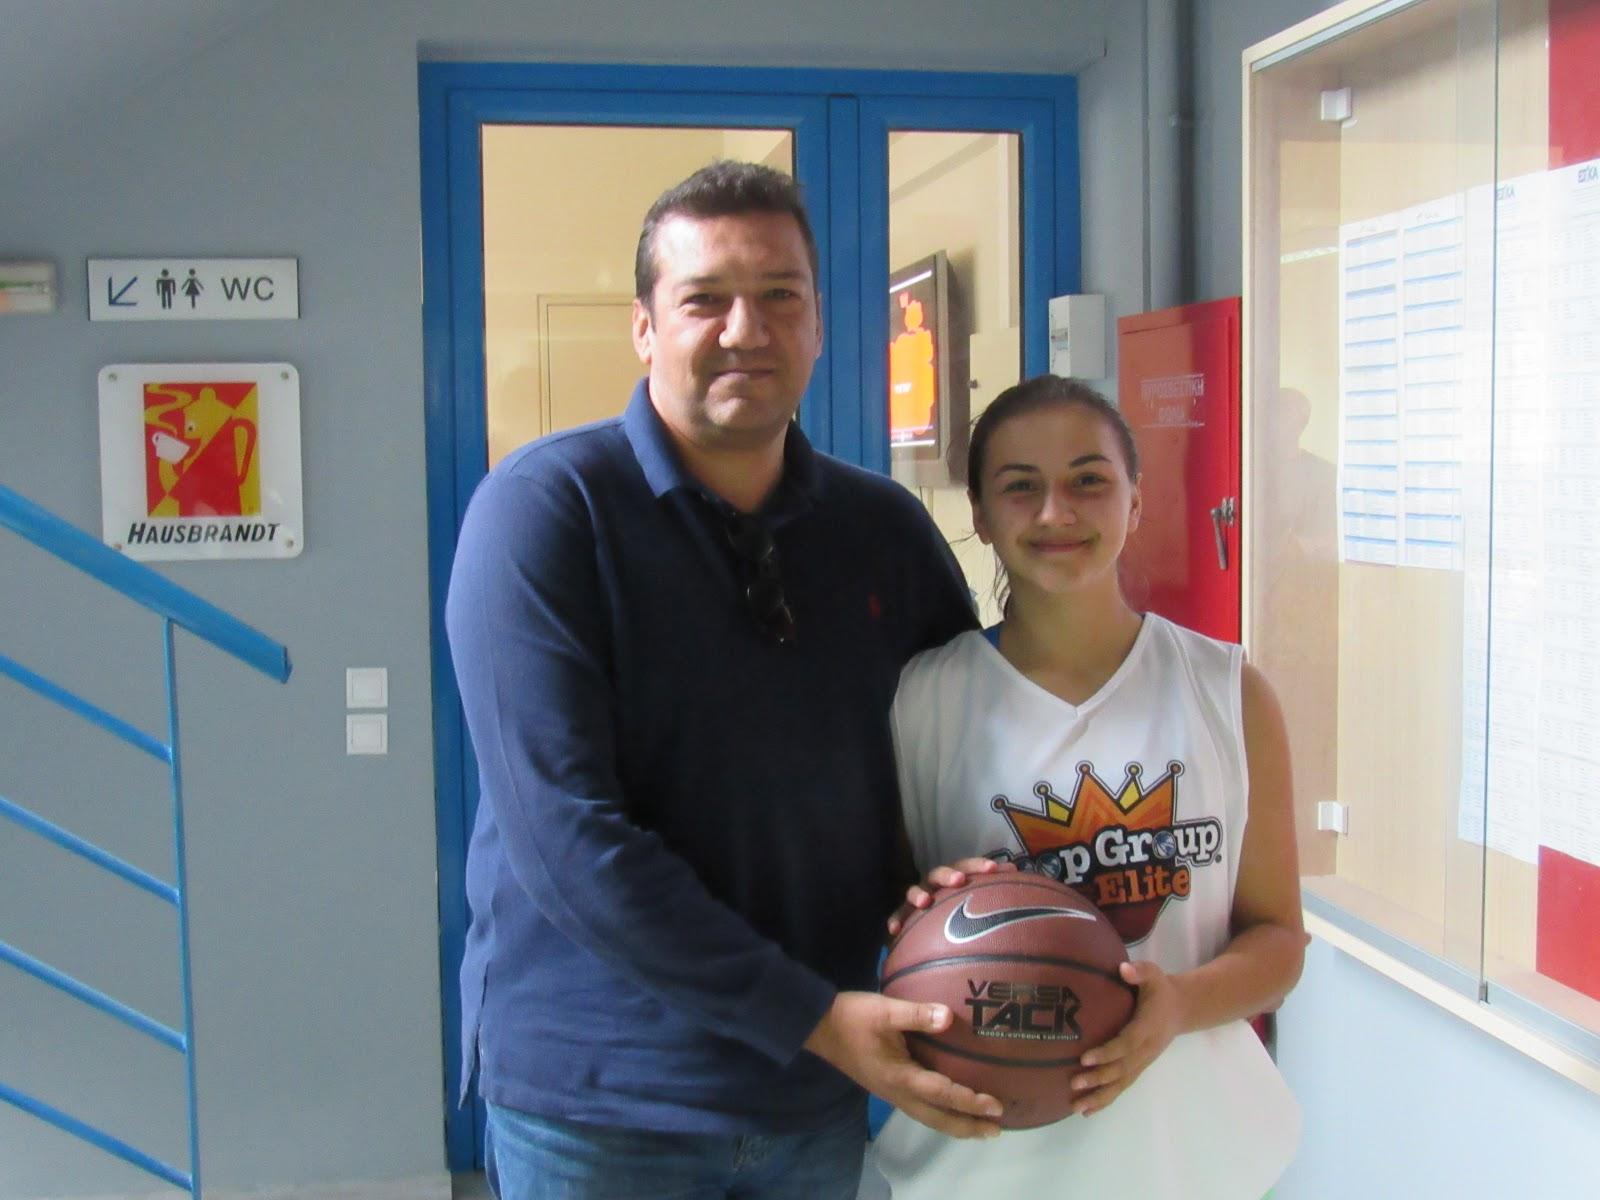 5894fdd9aab Ο συνδυασμός του μπάσκετ με τις σπουδές και πως αυτά μπορούν να  αναπτύσσονται παράλληλα είναι κάτι που απασχολεί πάντα τους γονείς. Το Hoop  Camp κατανοώντας ...